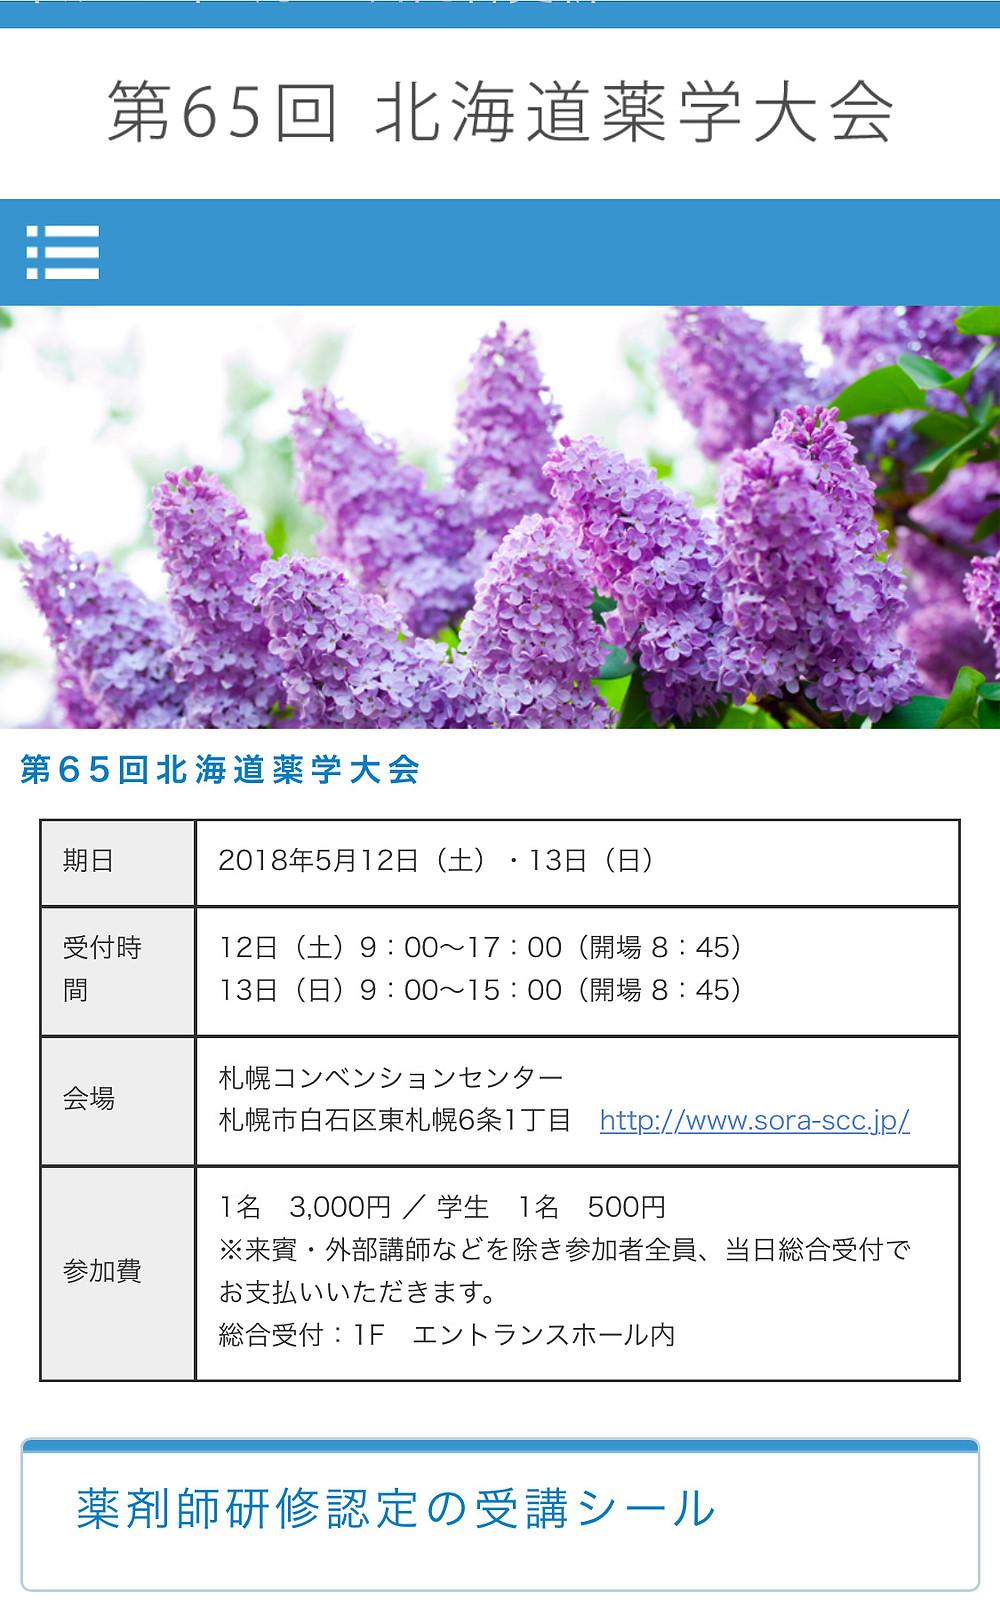 北海道薬学大会 ハスカップ研究